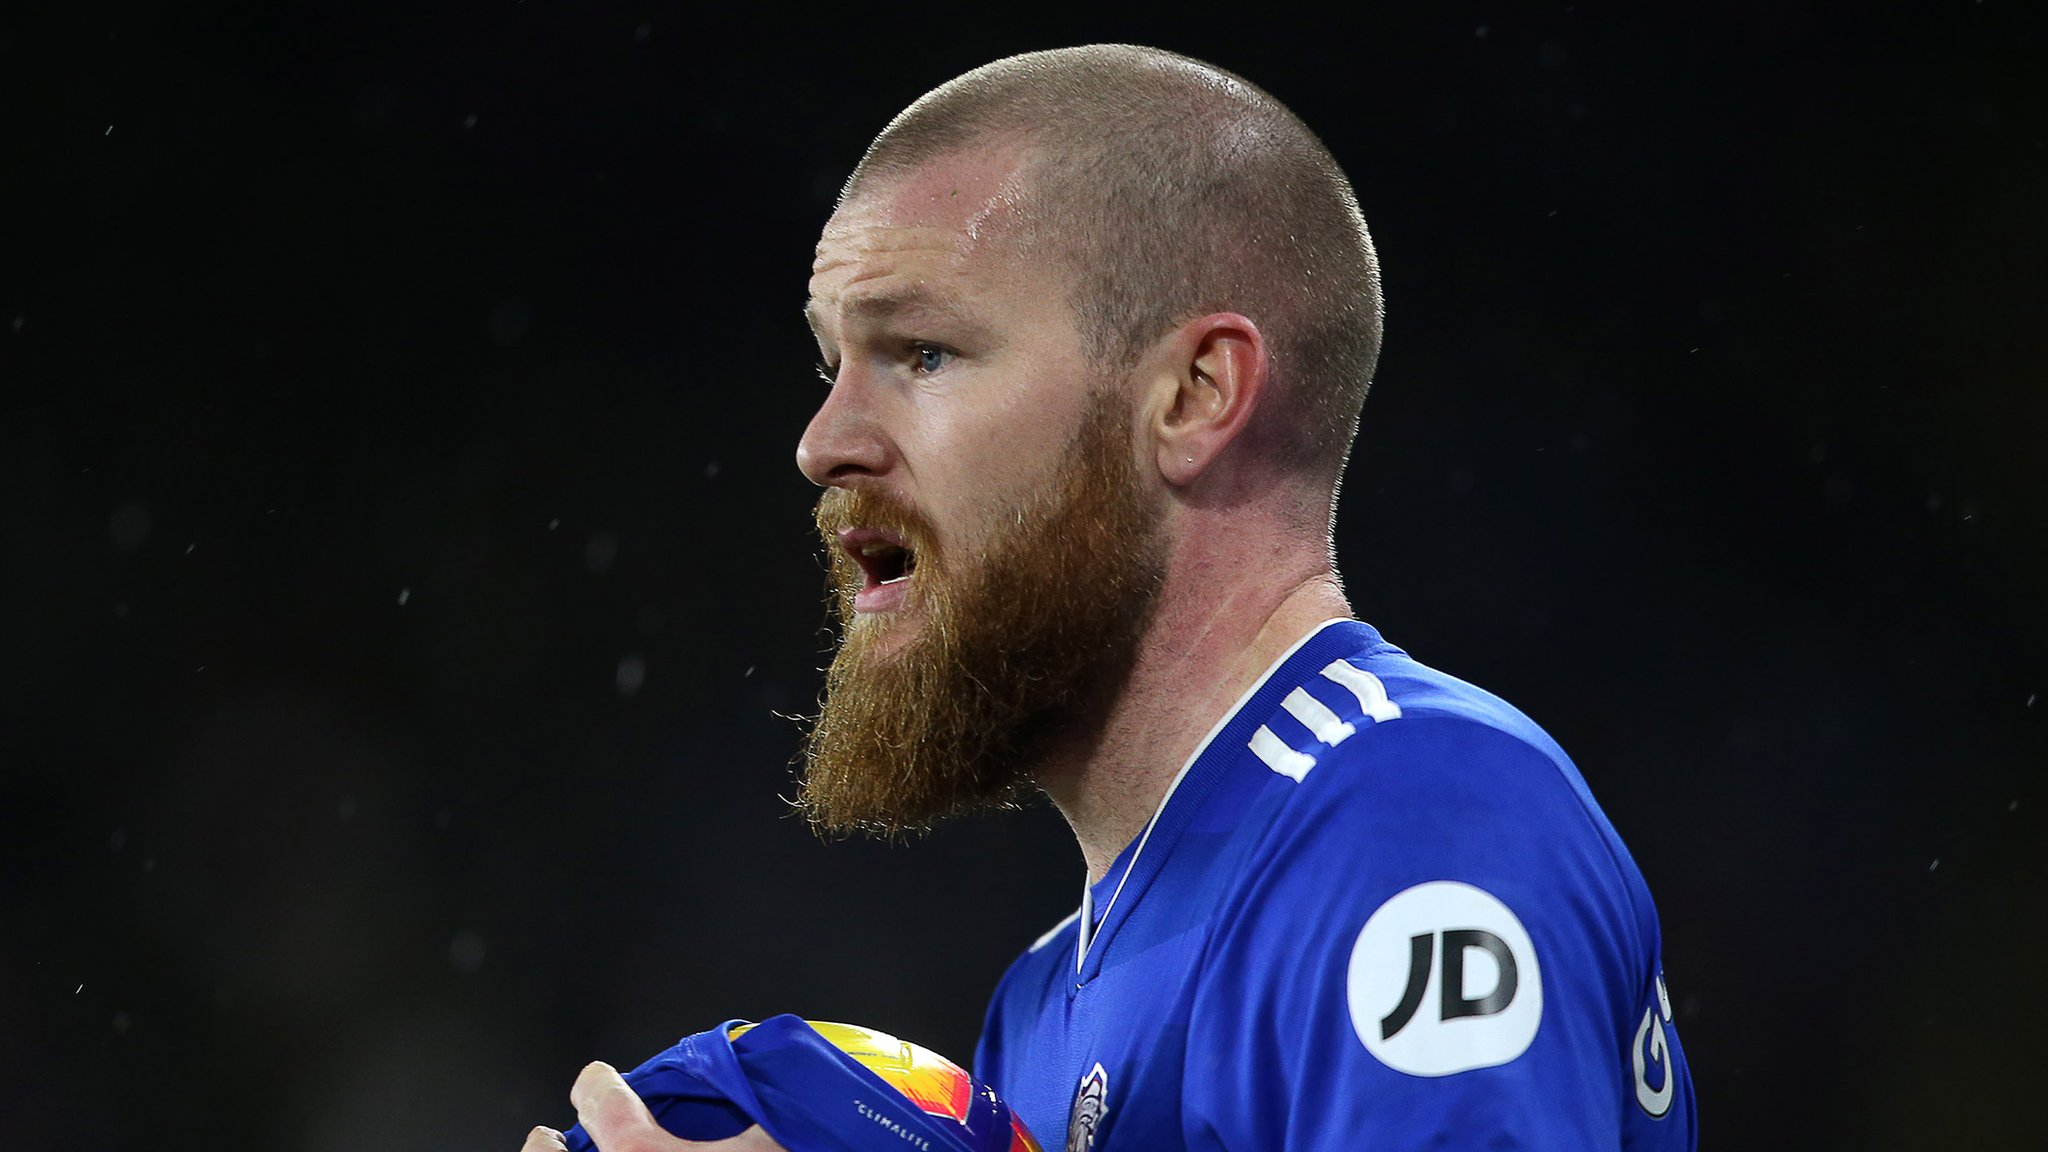 Aron Gunnarsson: Cardiff City midfielder to join Al-Arabi at end of season